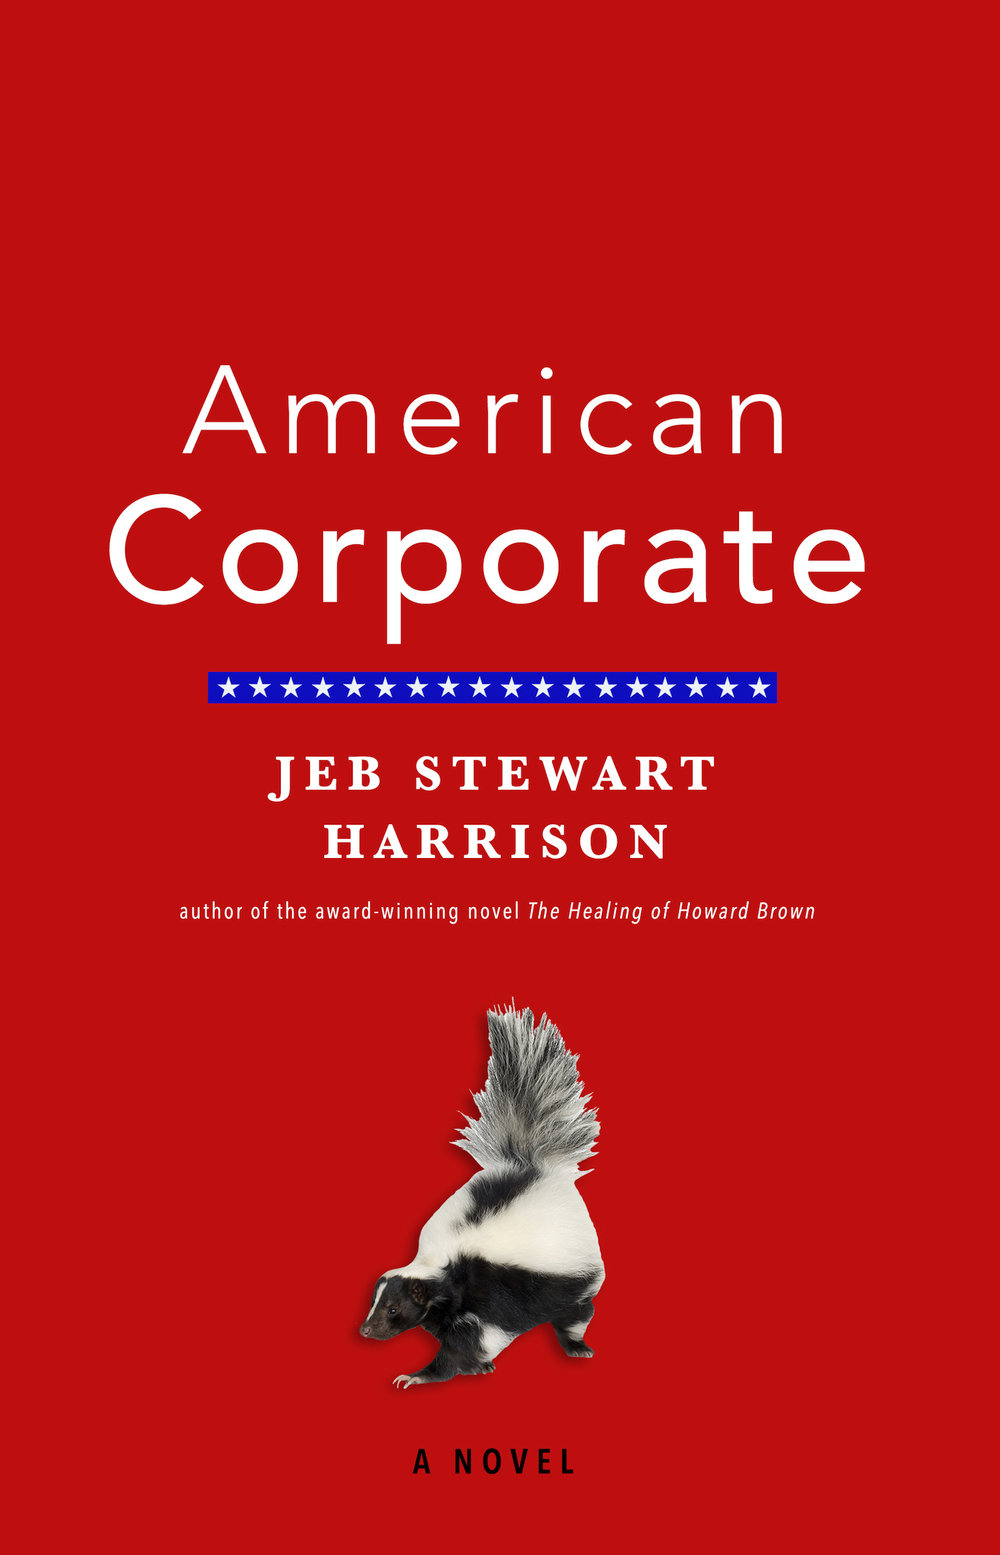 American Corporate.jpg